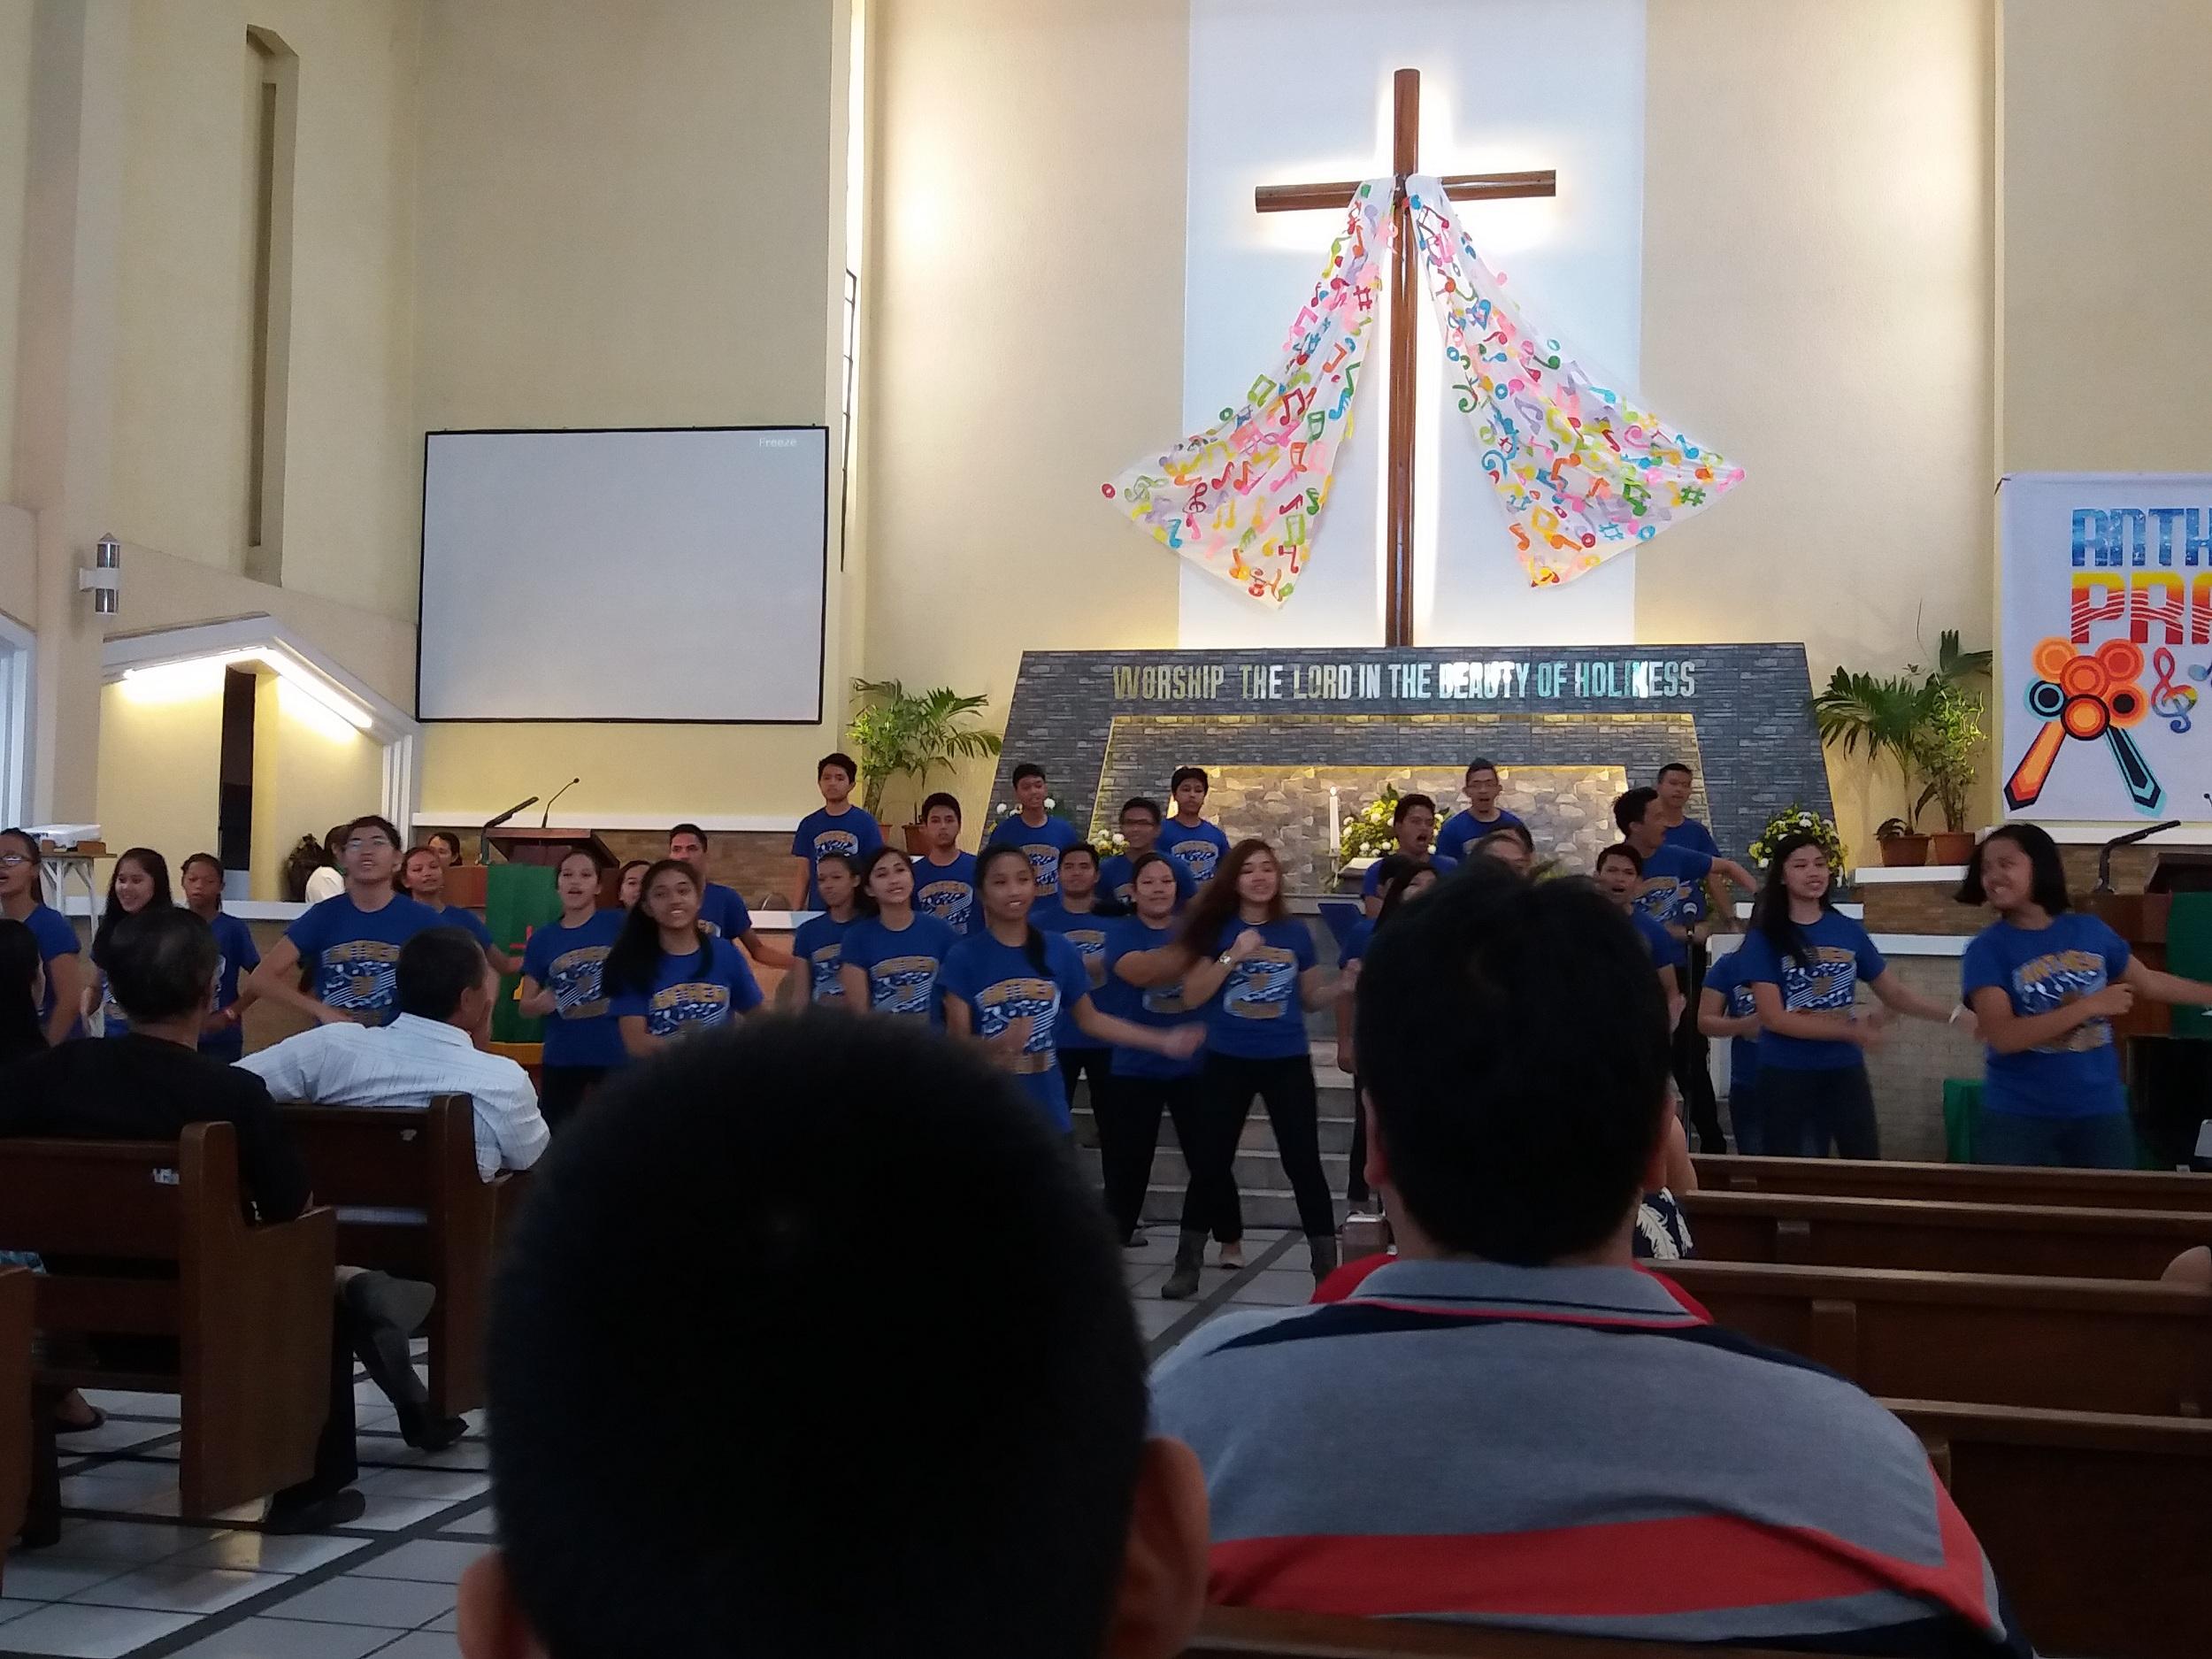 youthSUNsep18-16